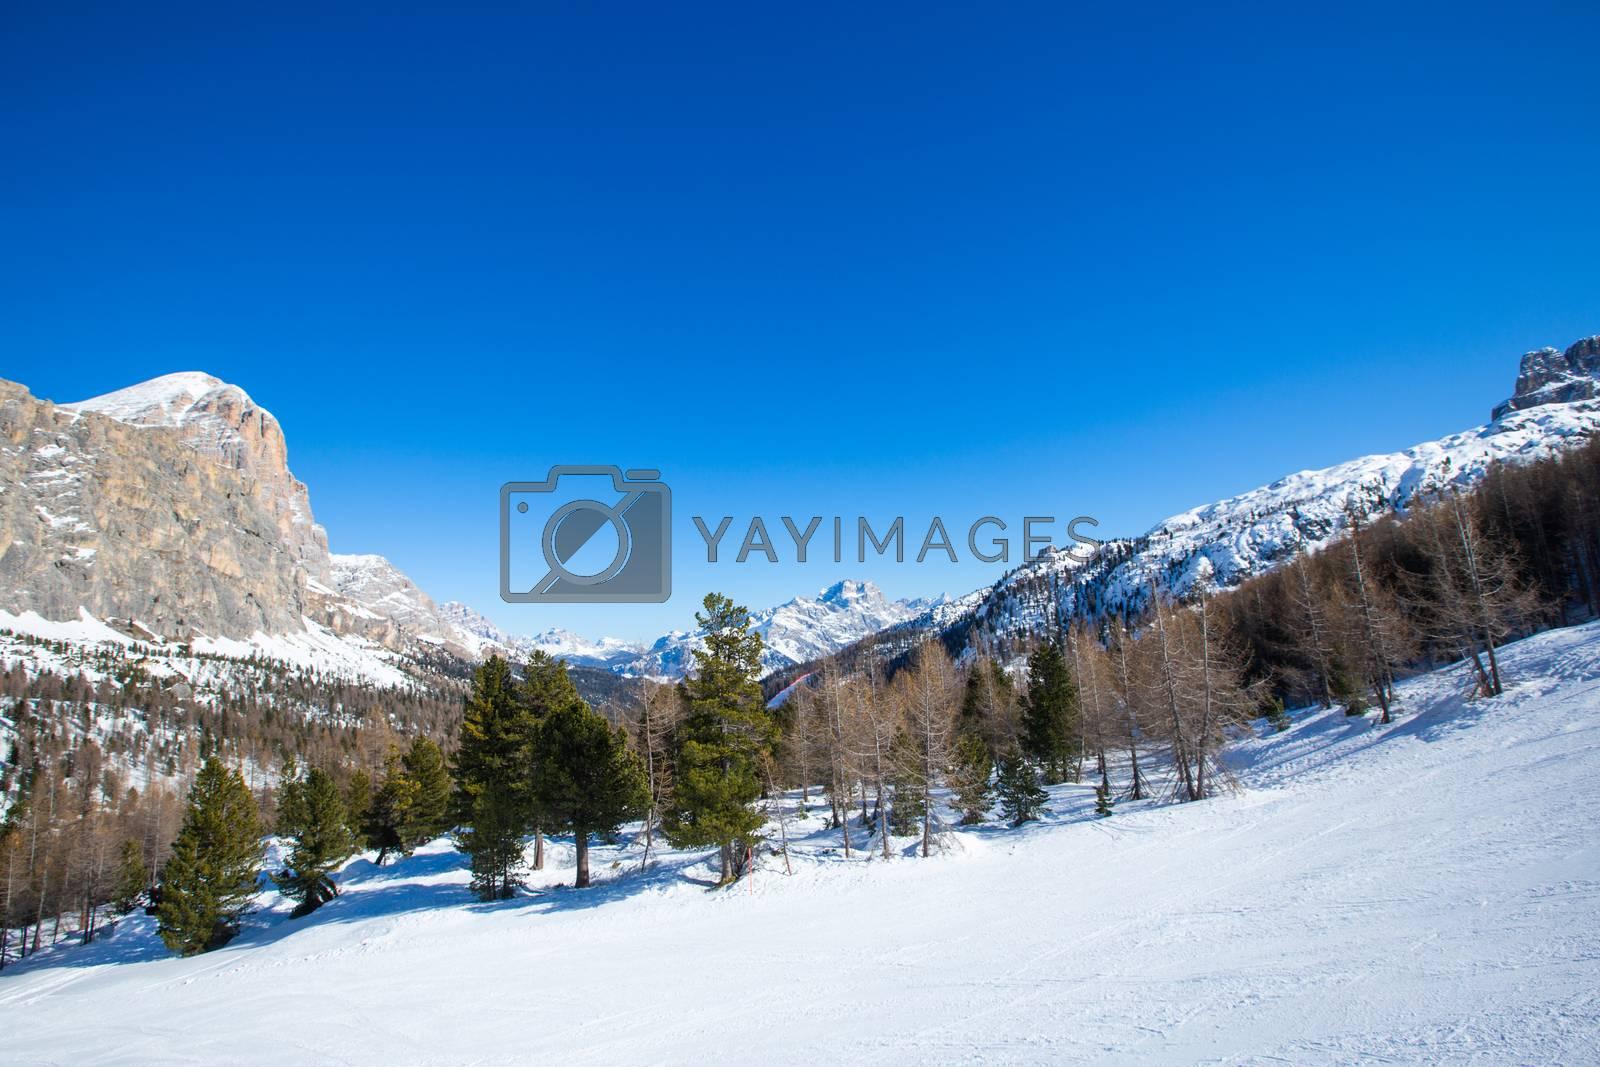 Royalty free image of Dolomites winter mountains ski resort by destillat